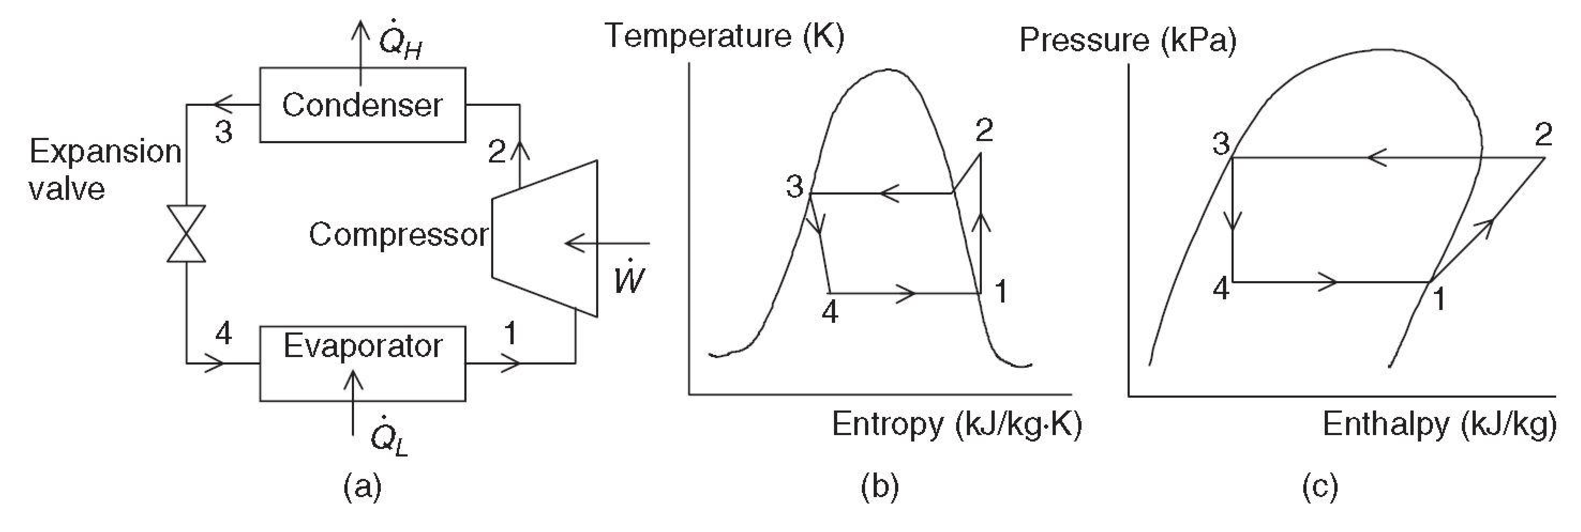 evaporator hvac diagram wiring diagrams schematics condenser coil drawing condenser coil diagram [ 1581 x 532 Pixel ]